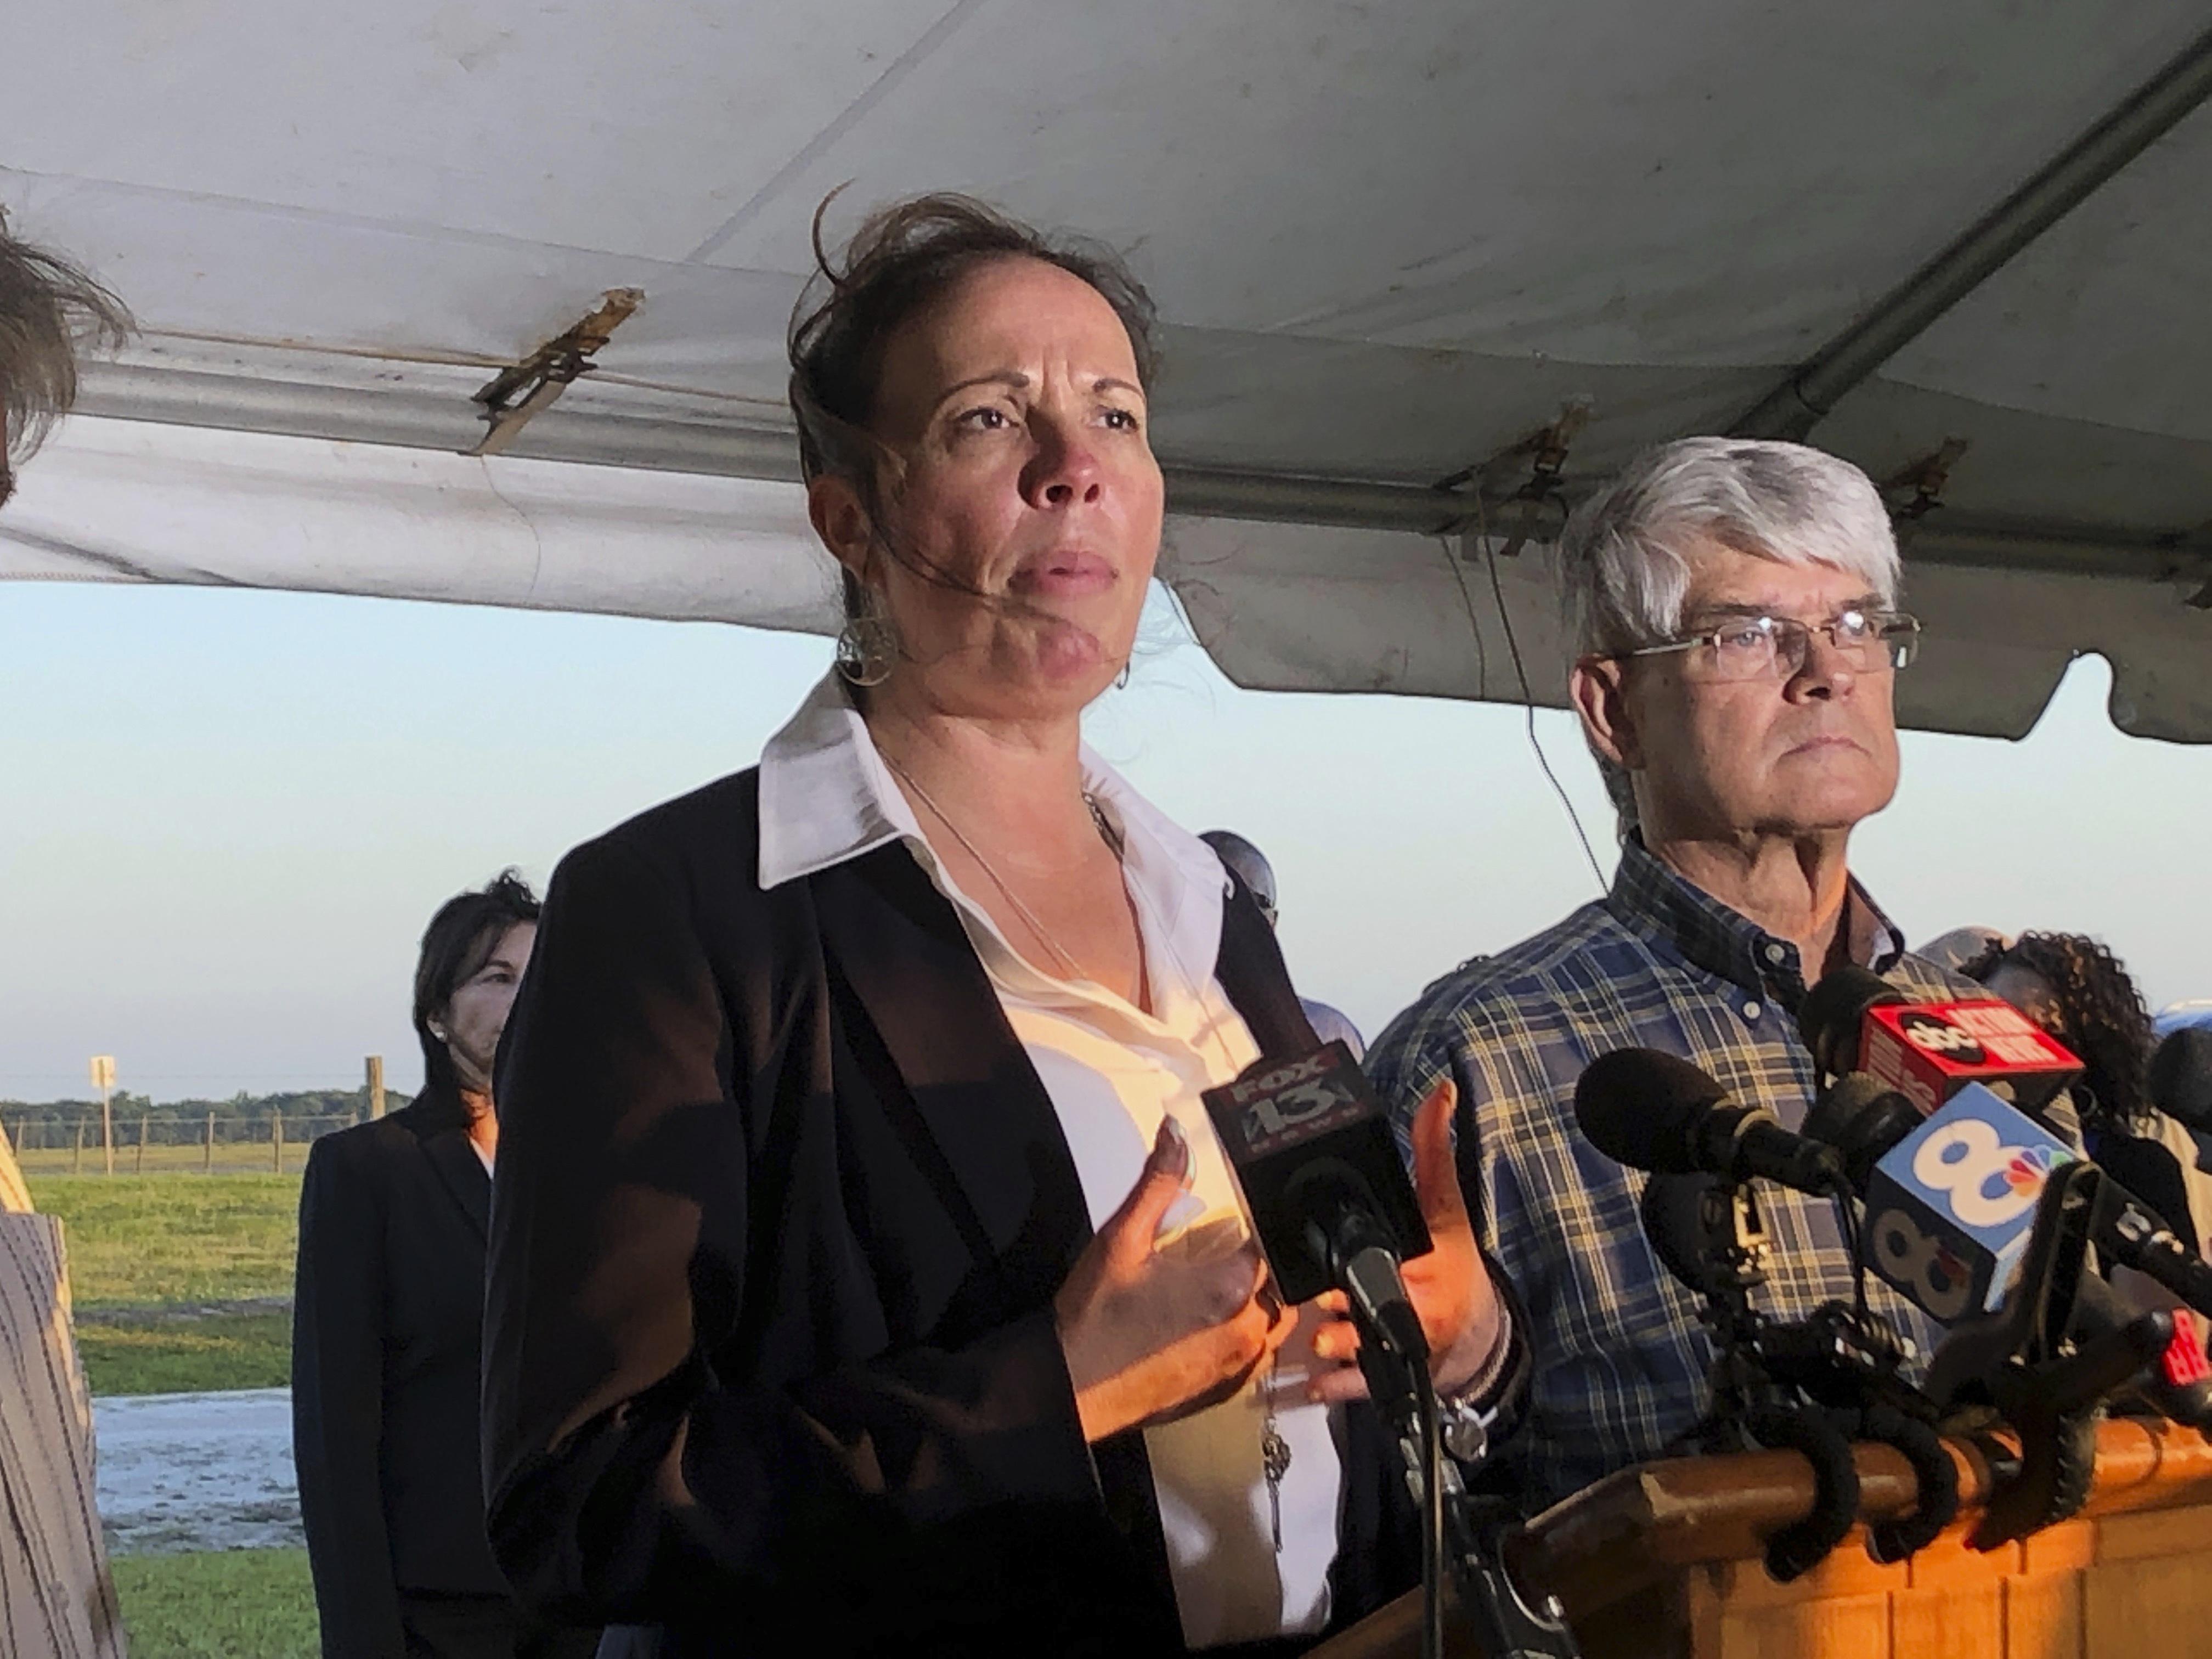 Bobby Joe Long, prominent Florida serial killer, was